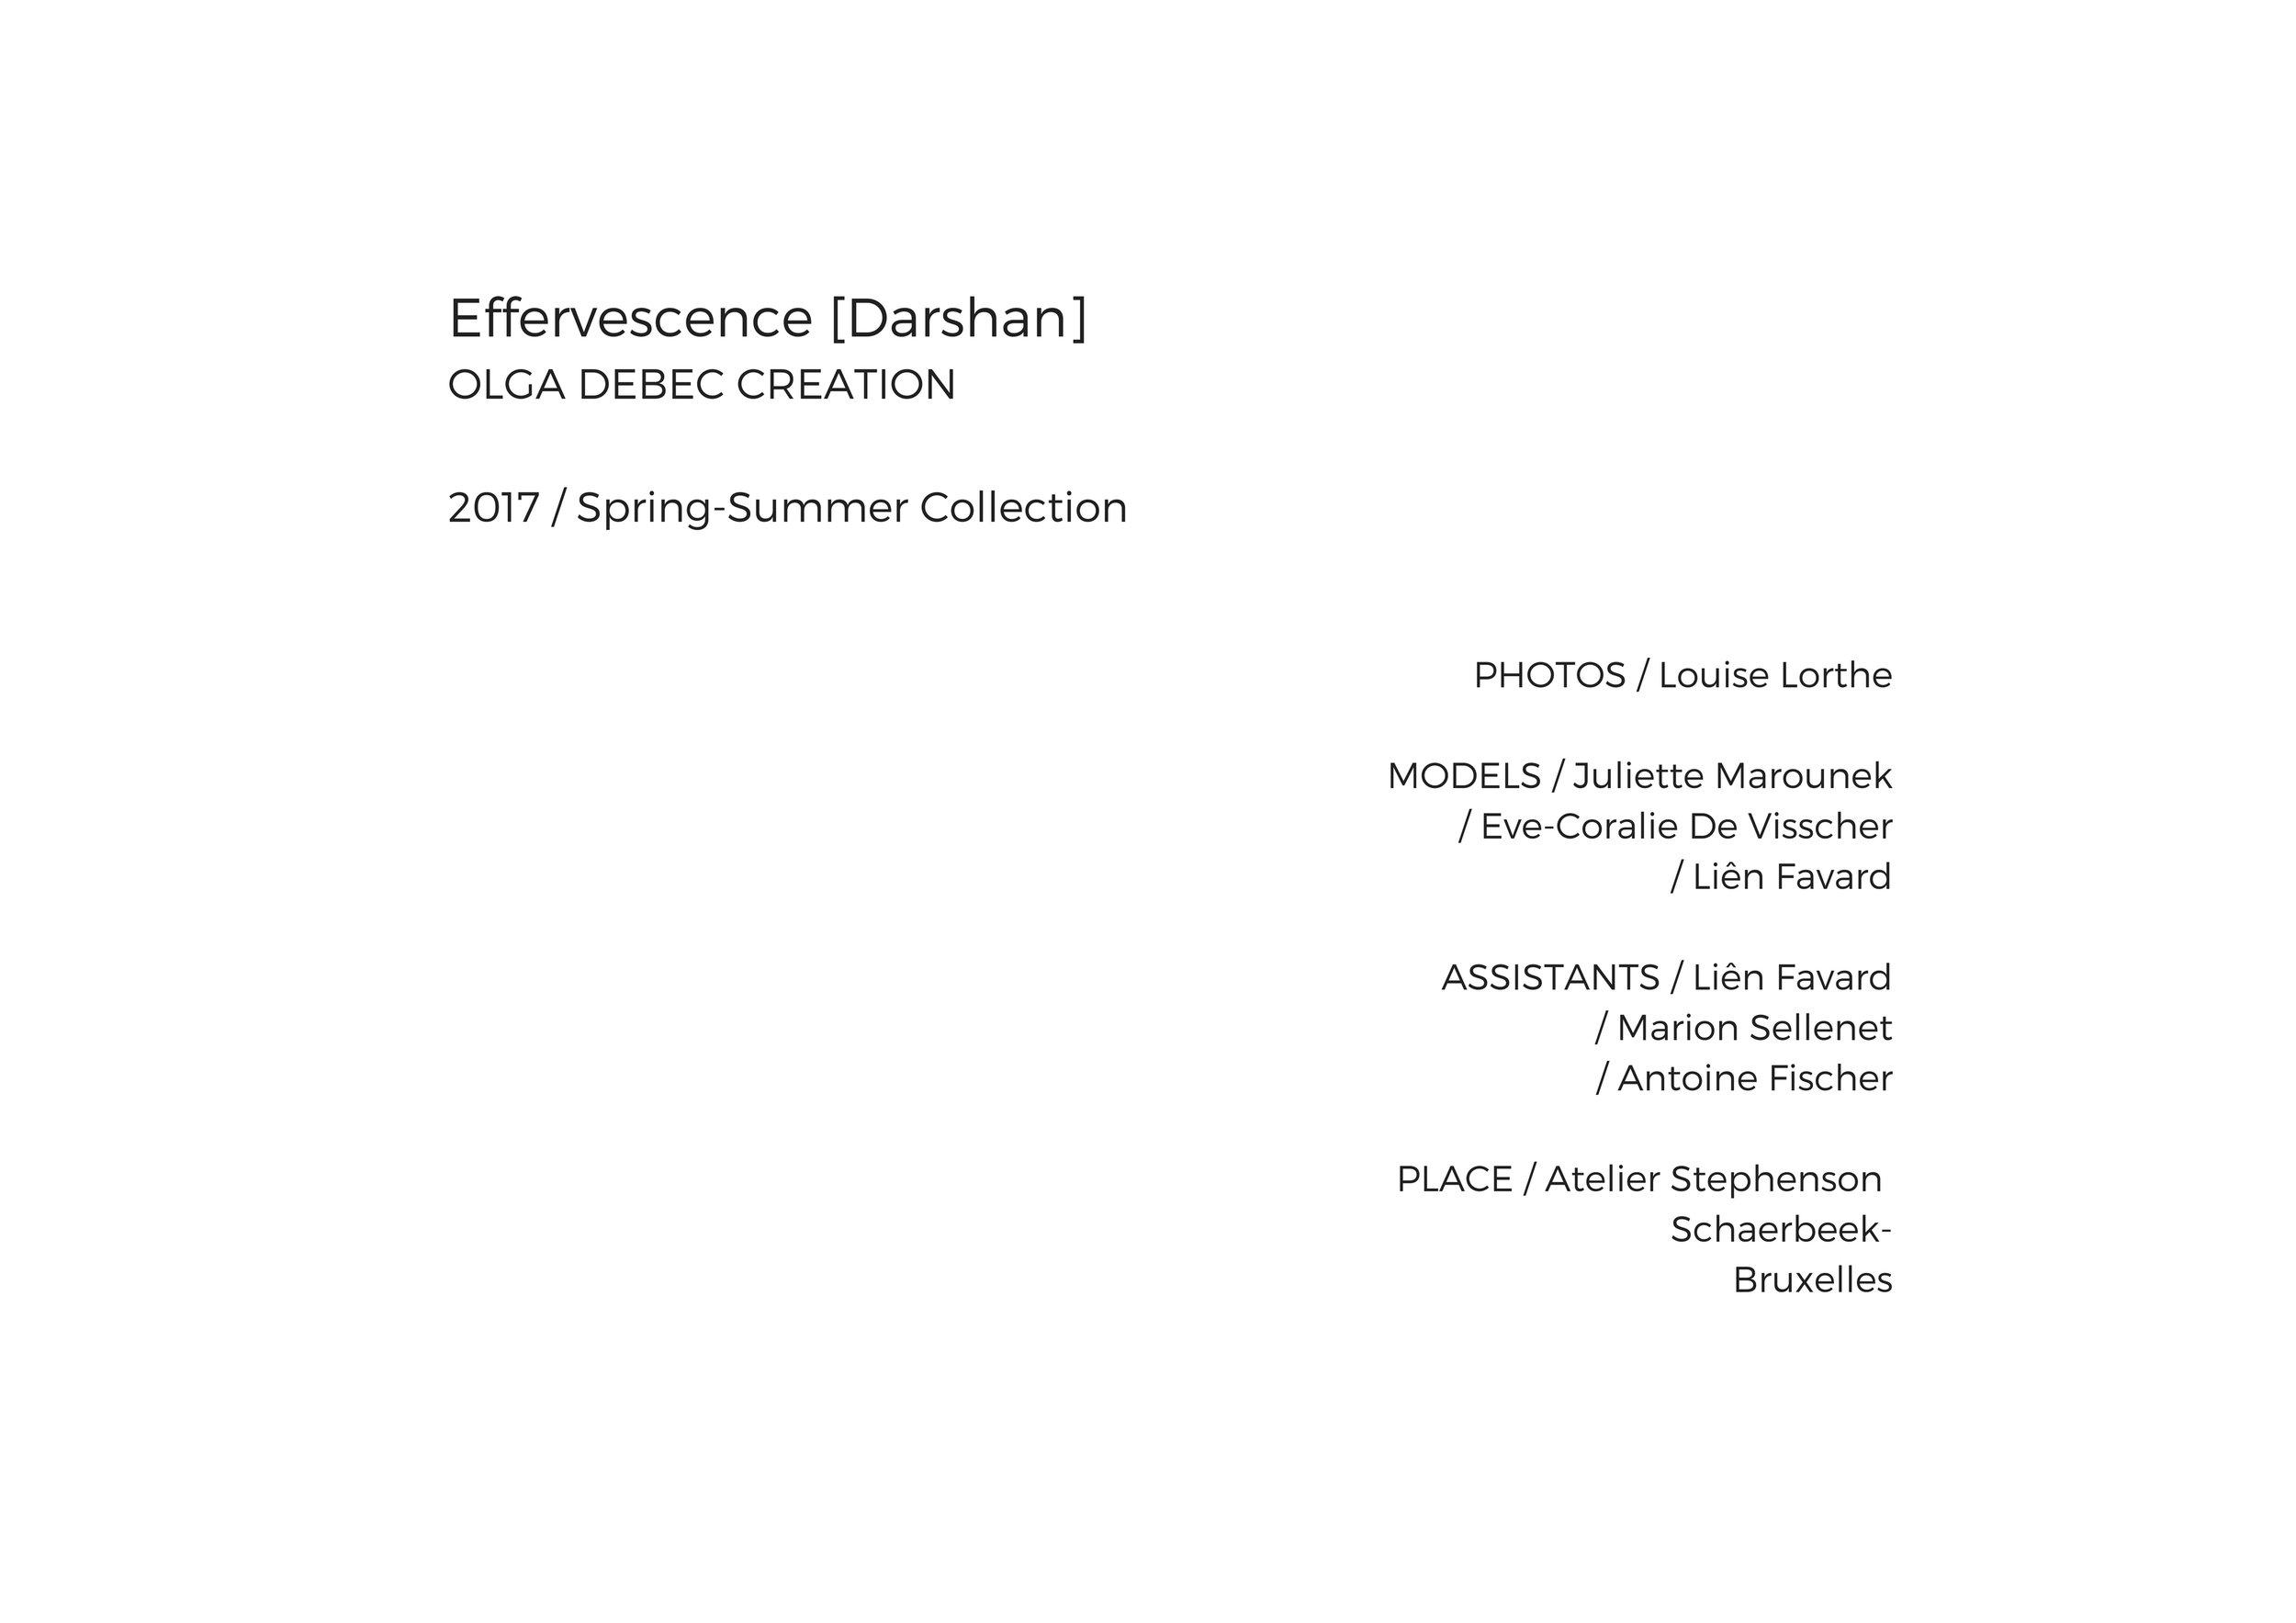 Effervescence Darshan.jpg